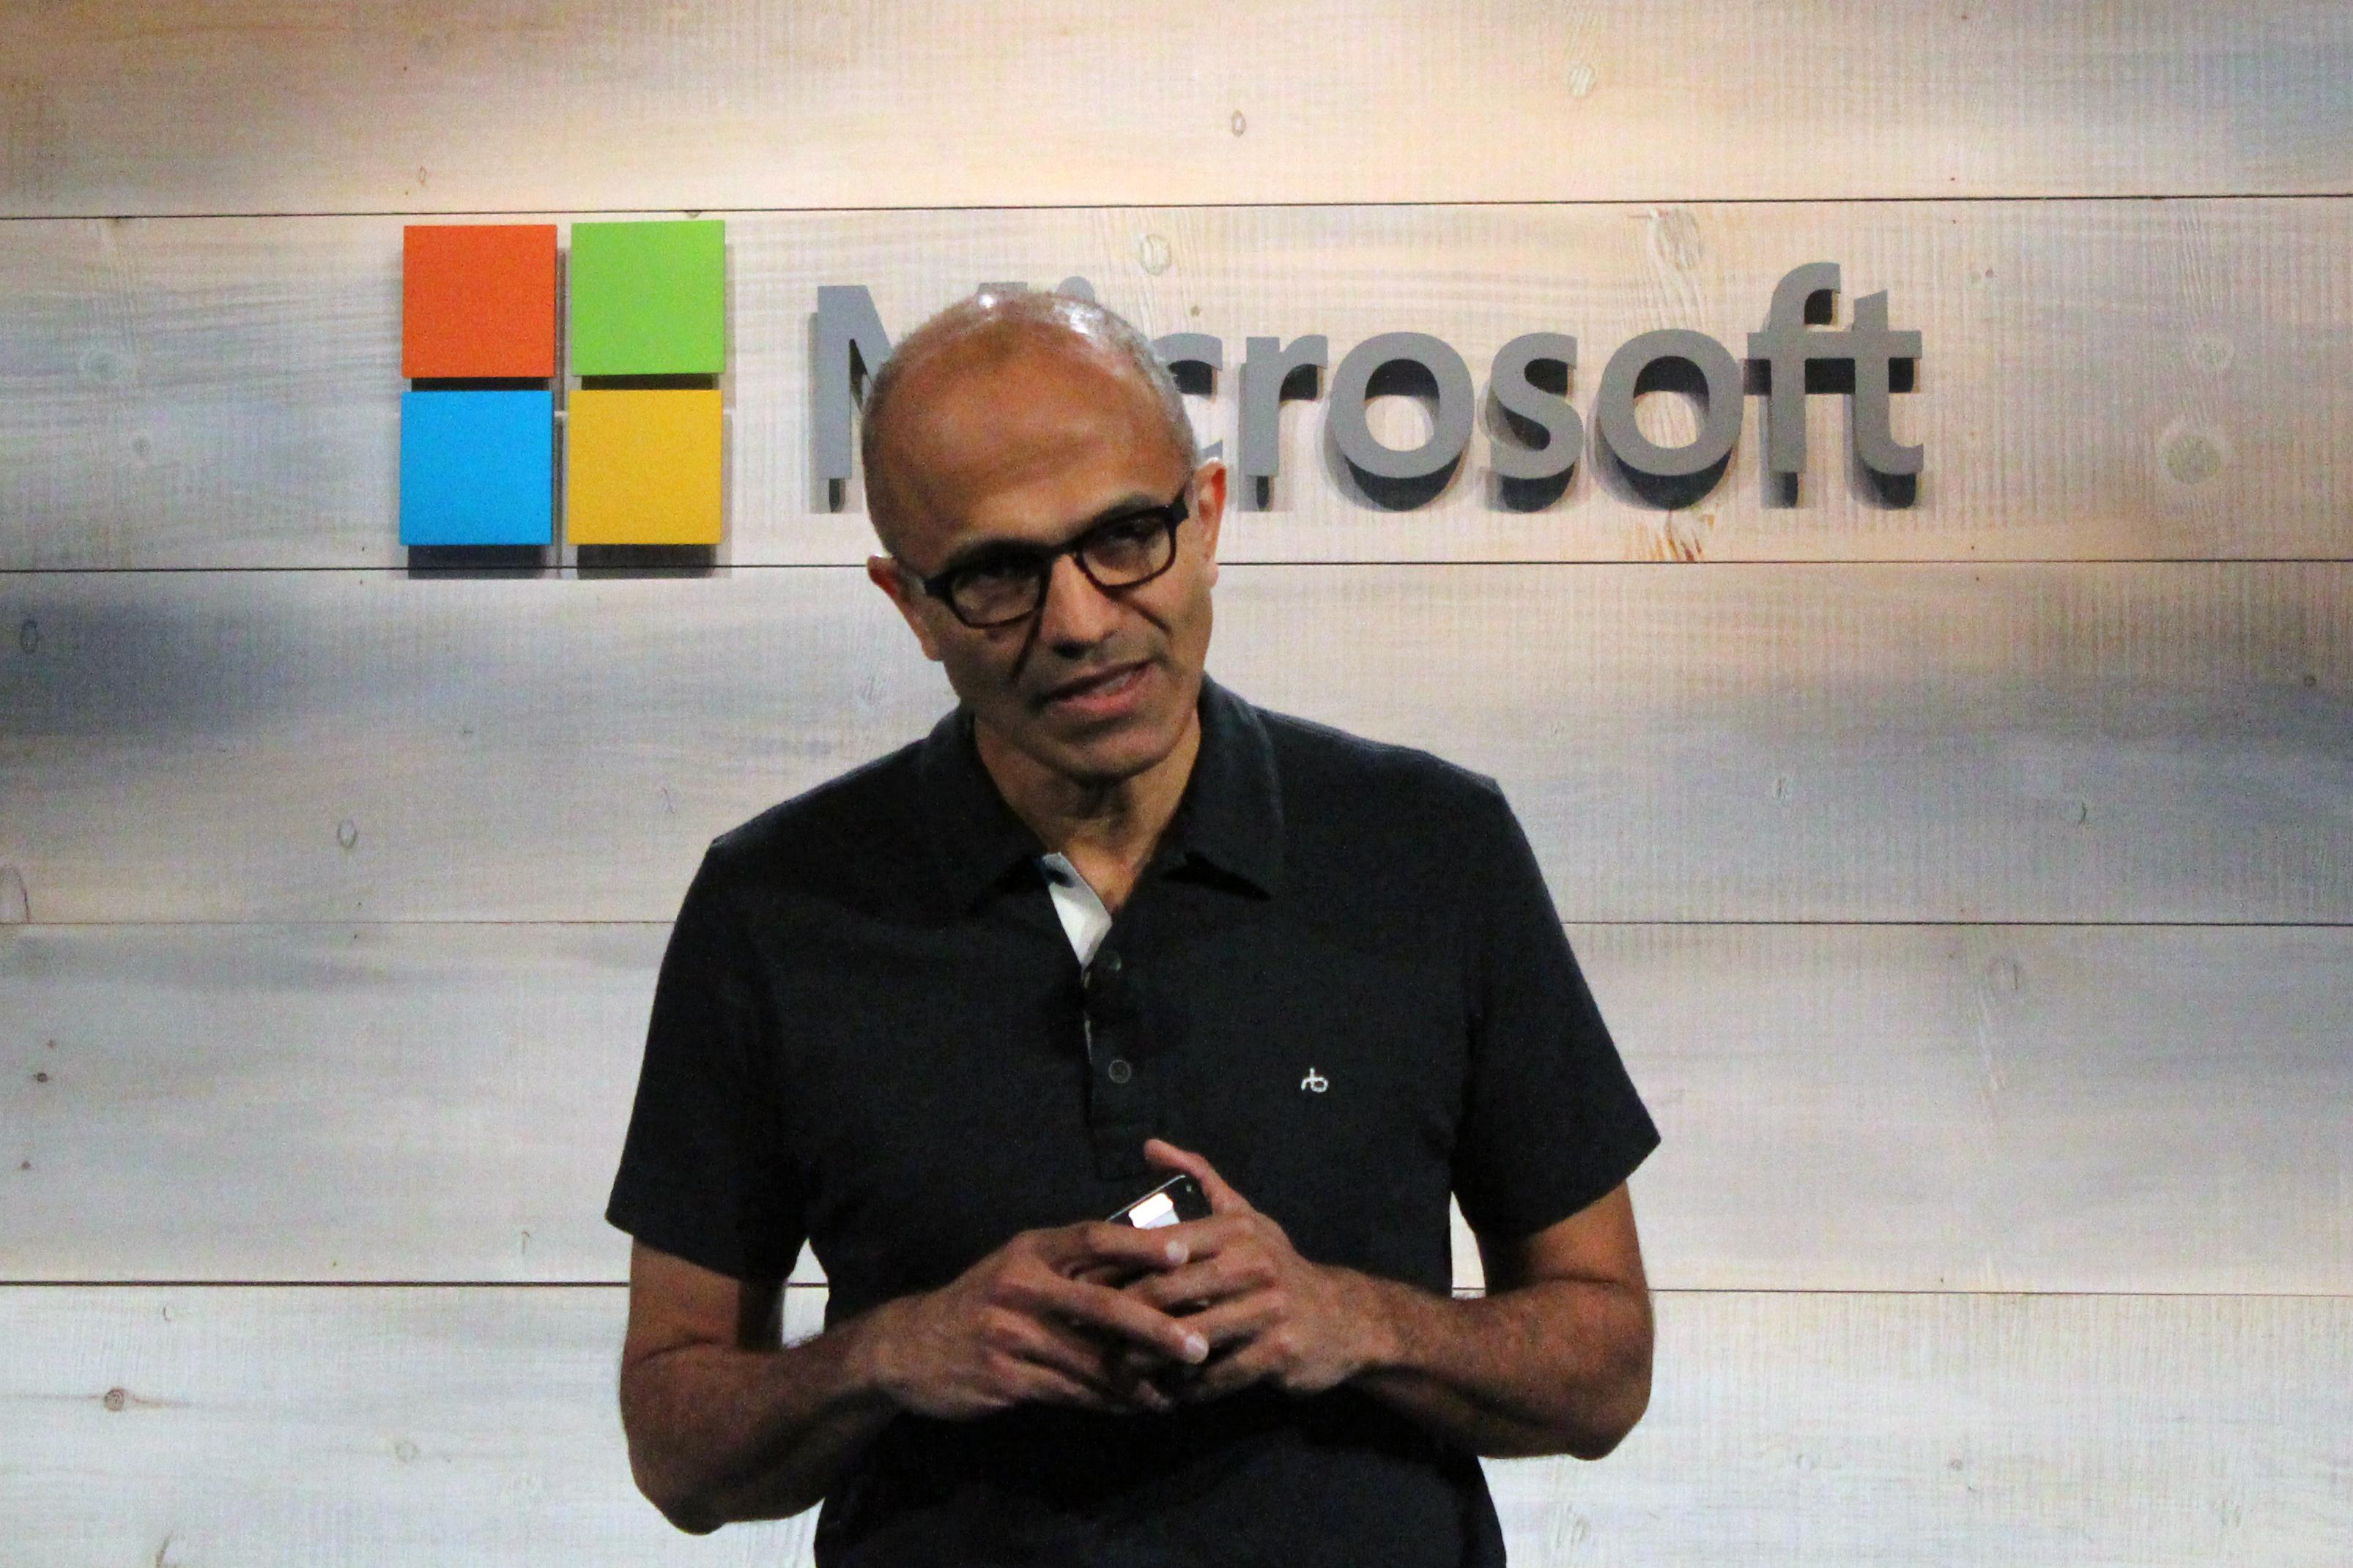 Microsoft CEO Satya Nadella speaks at a Microsoft cloud event. Photo by Jonathan Vanian/Gigaom